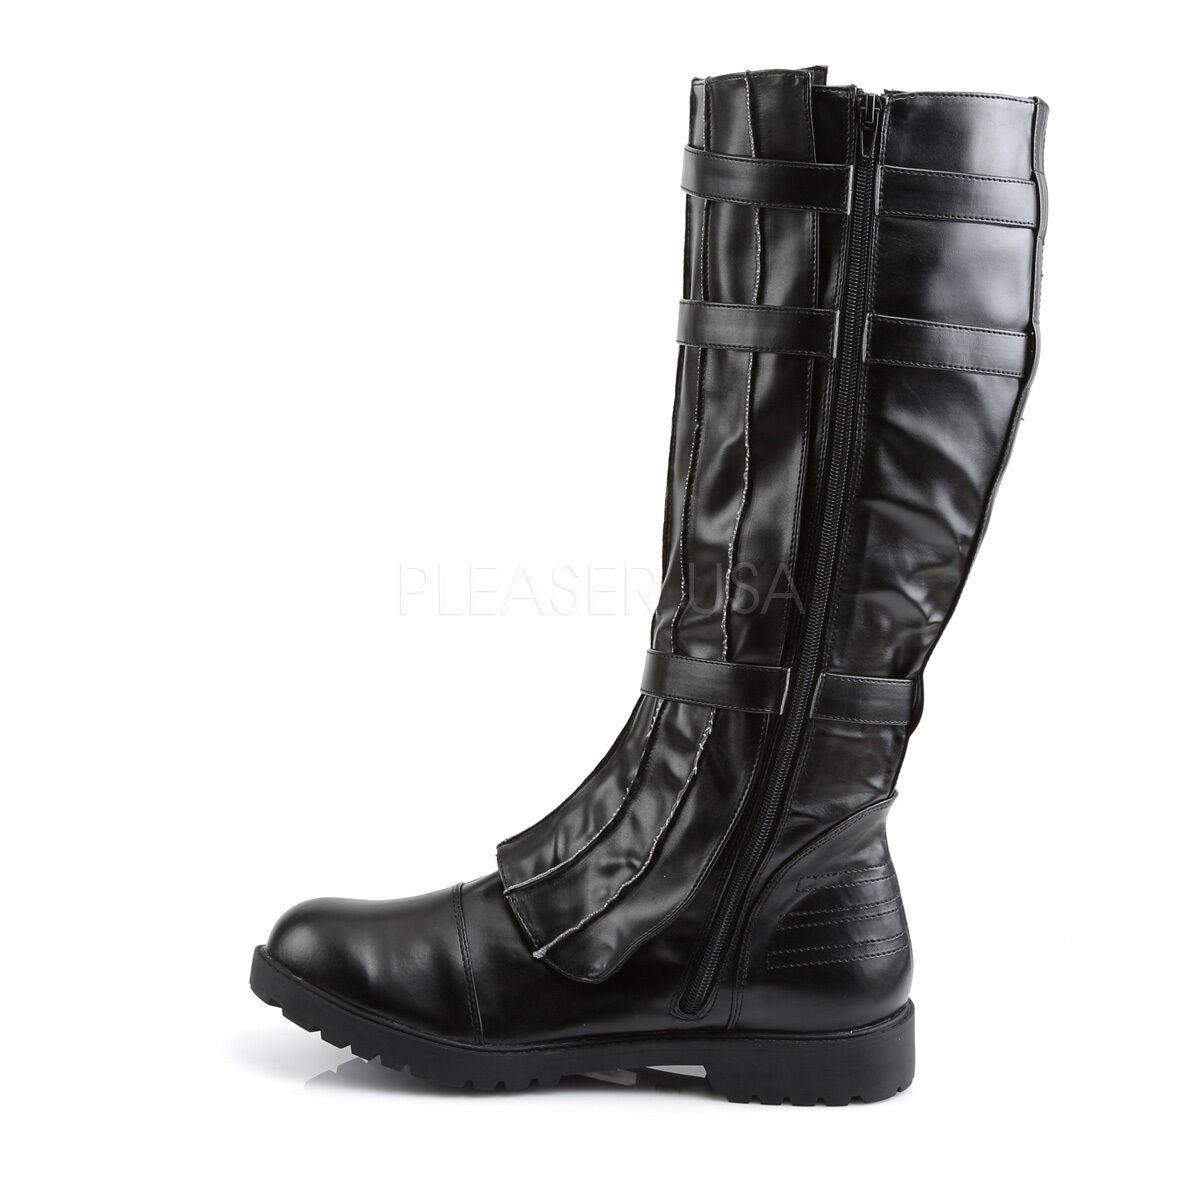 Funtasma Matte nero Walker Hero Strap Strap Strap Knee stivali Cosplay Goth Uomo 8-14 d096ca